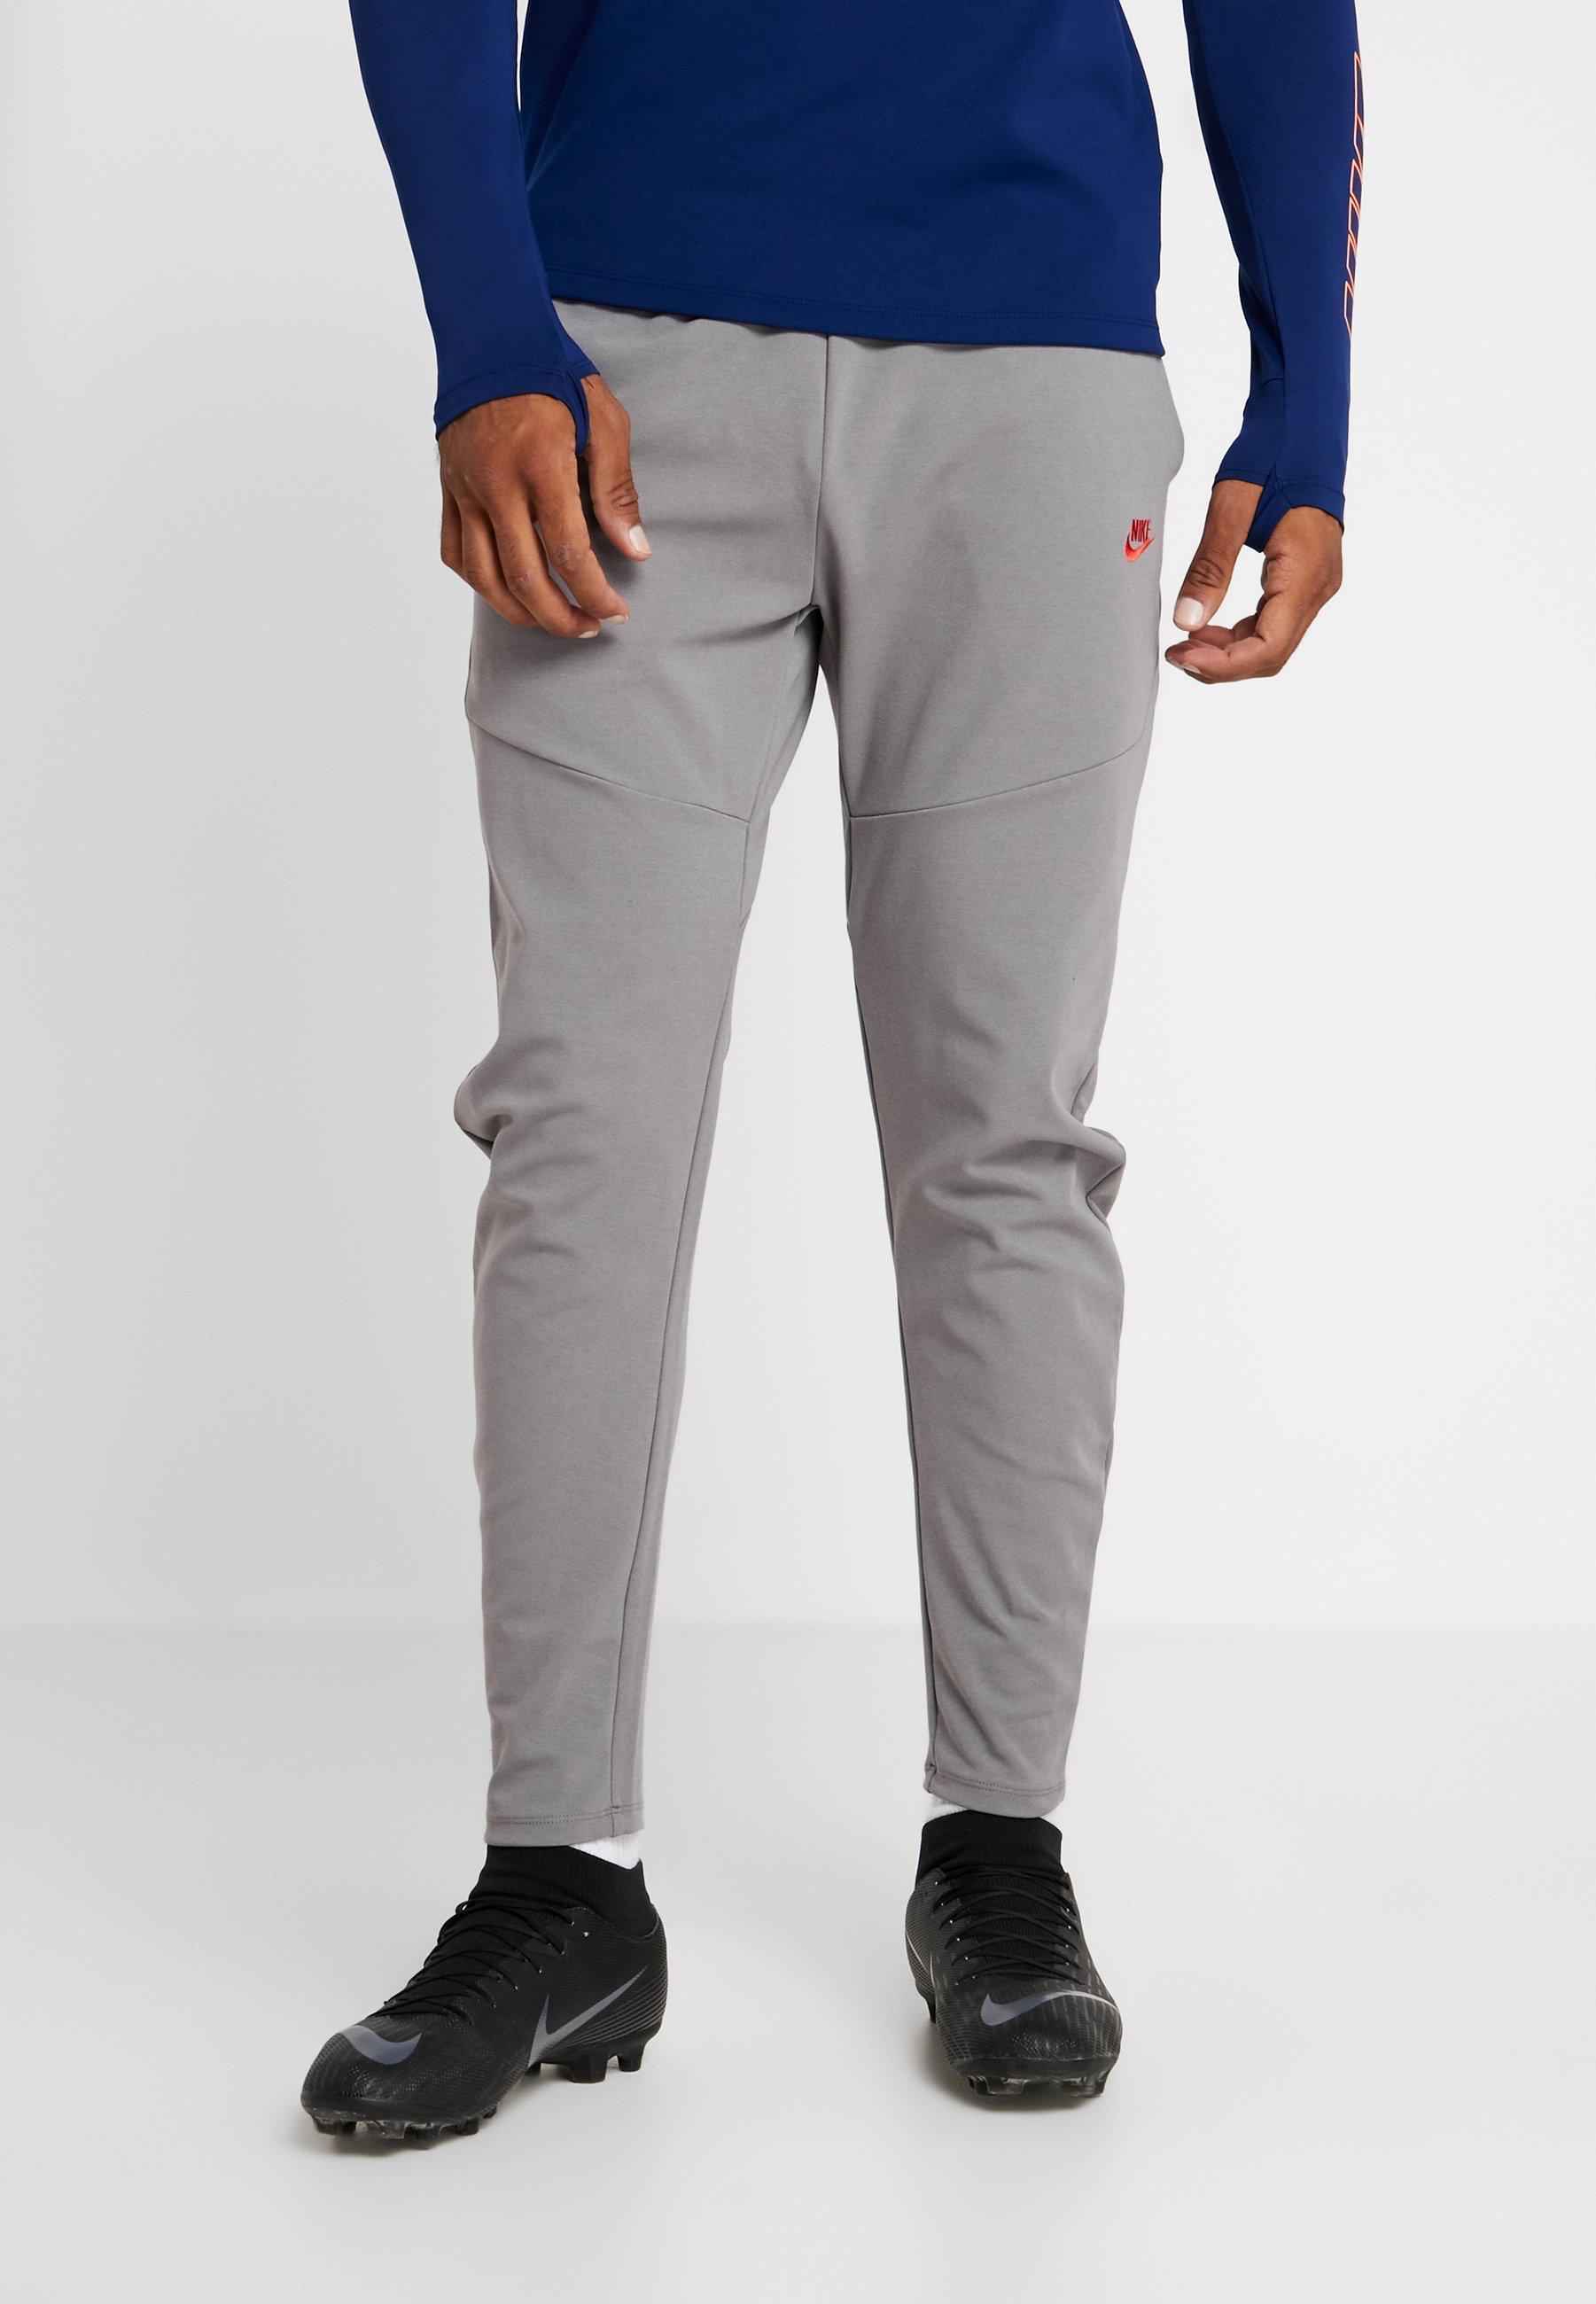 Necesario paso Viento  Nike Performance ATLETICO MADRID PANT - Pantalones deportivos -  gunsmoke/sport red/gris oscuro - Zalando.es